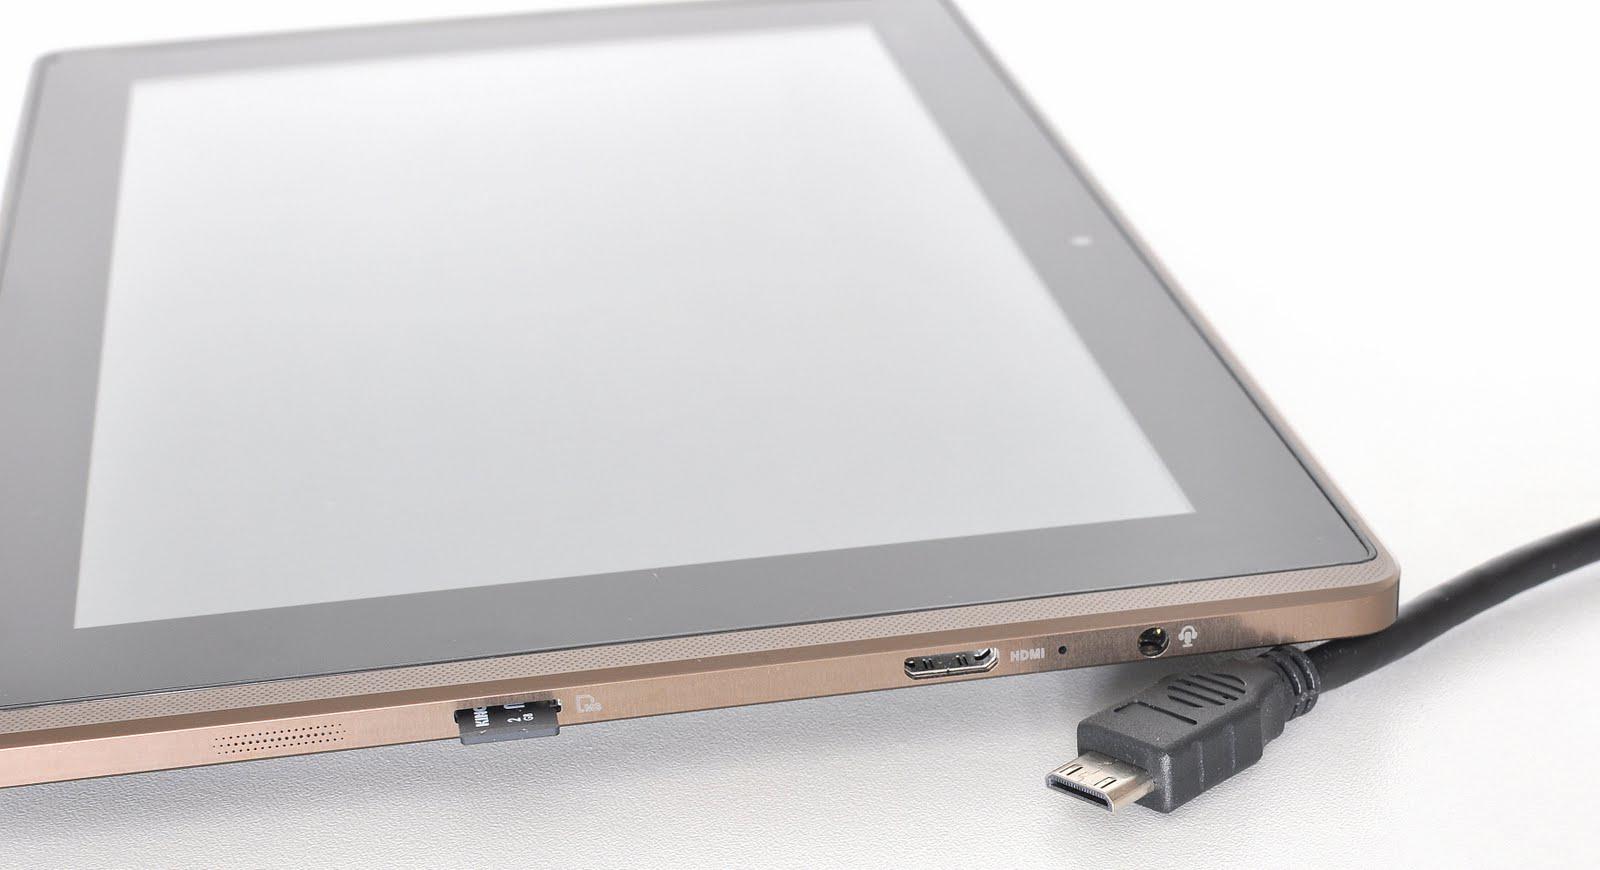 next inpact asus eee pad transformer la tablette convertible en netbook page 4. Black Bedroom Furniture Sets. Home Design Ideas